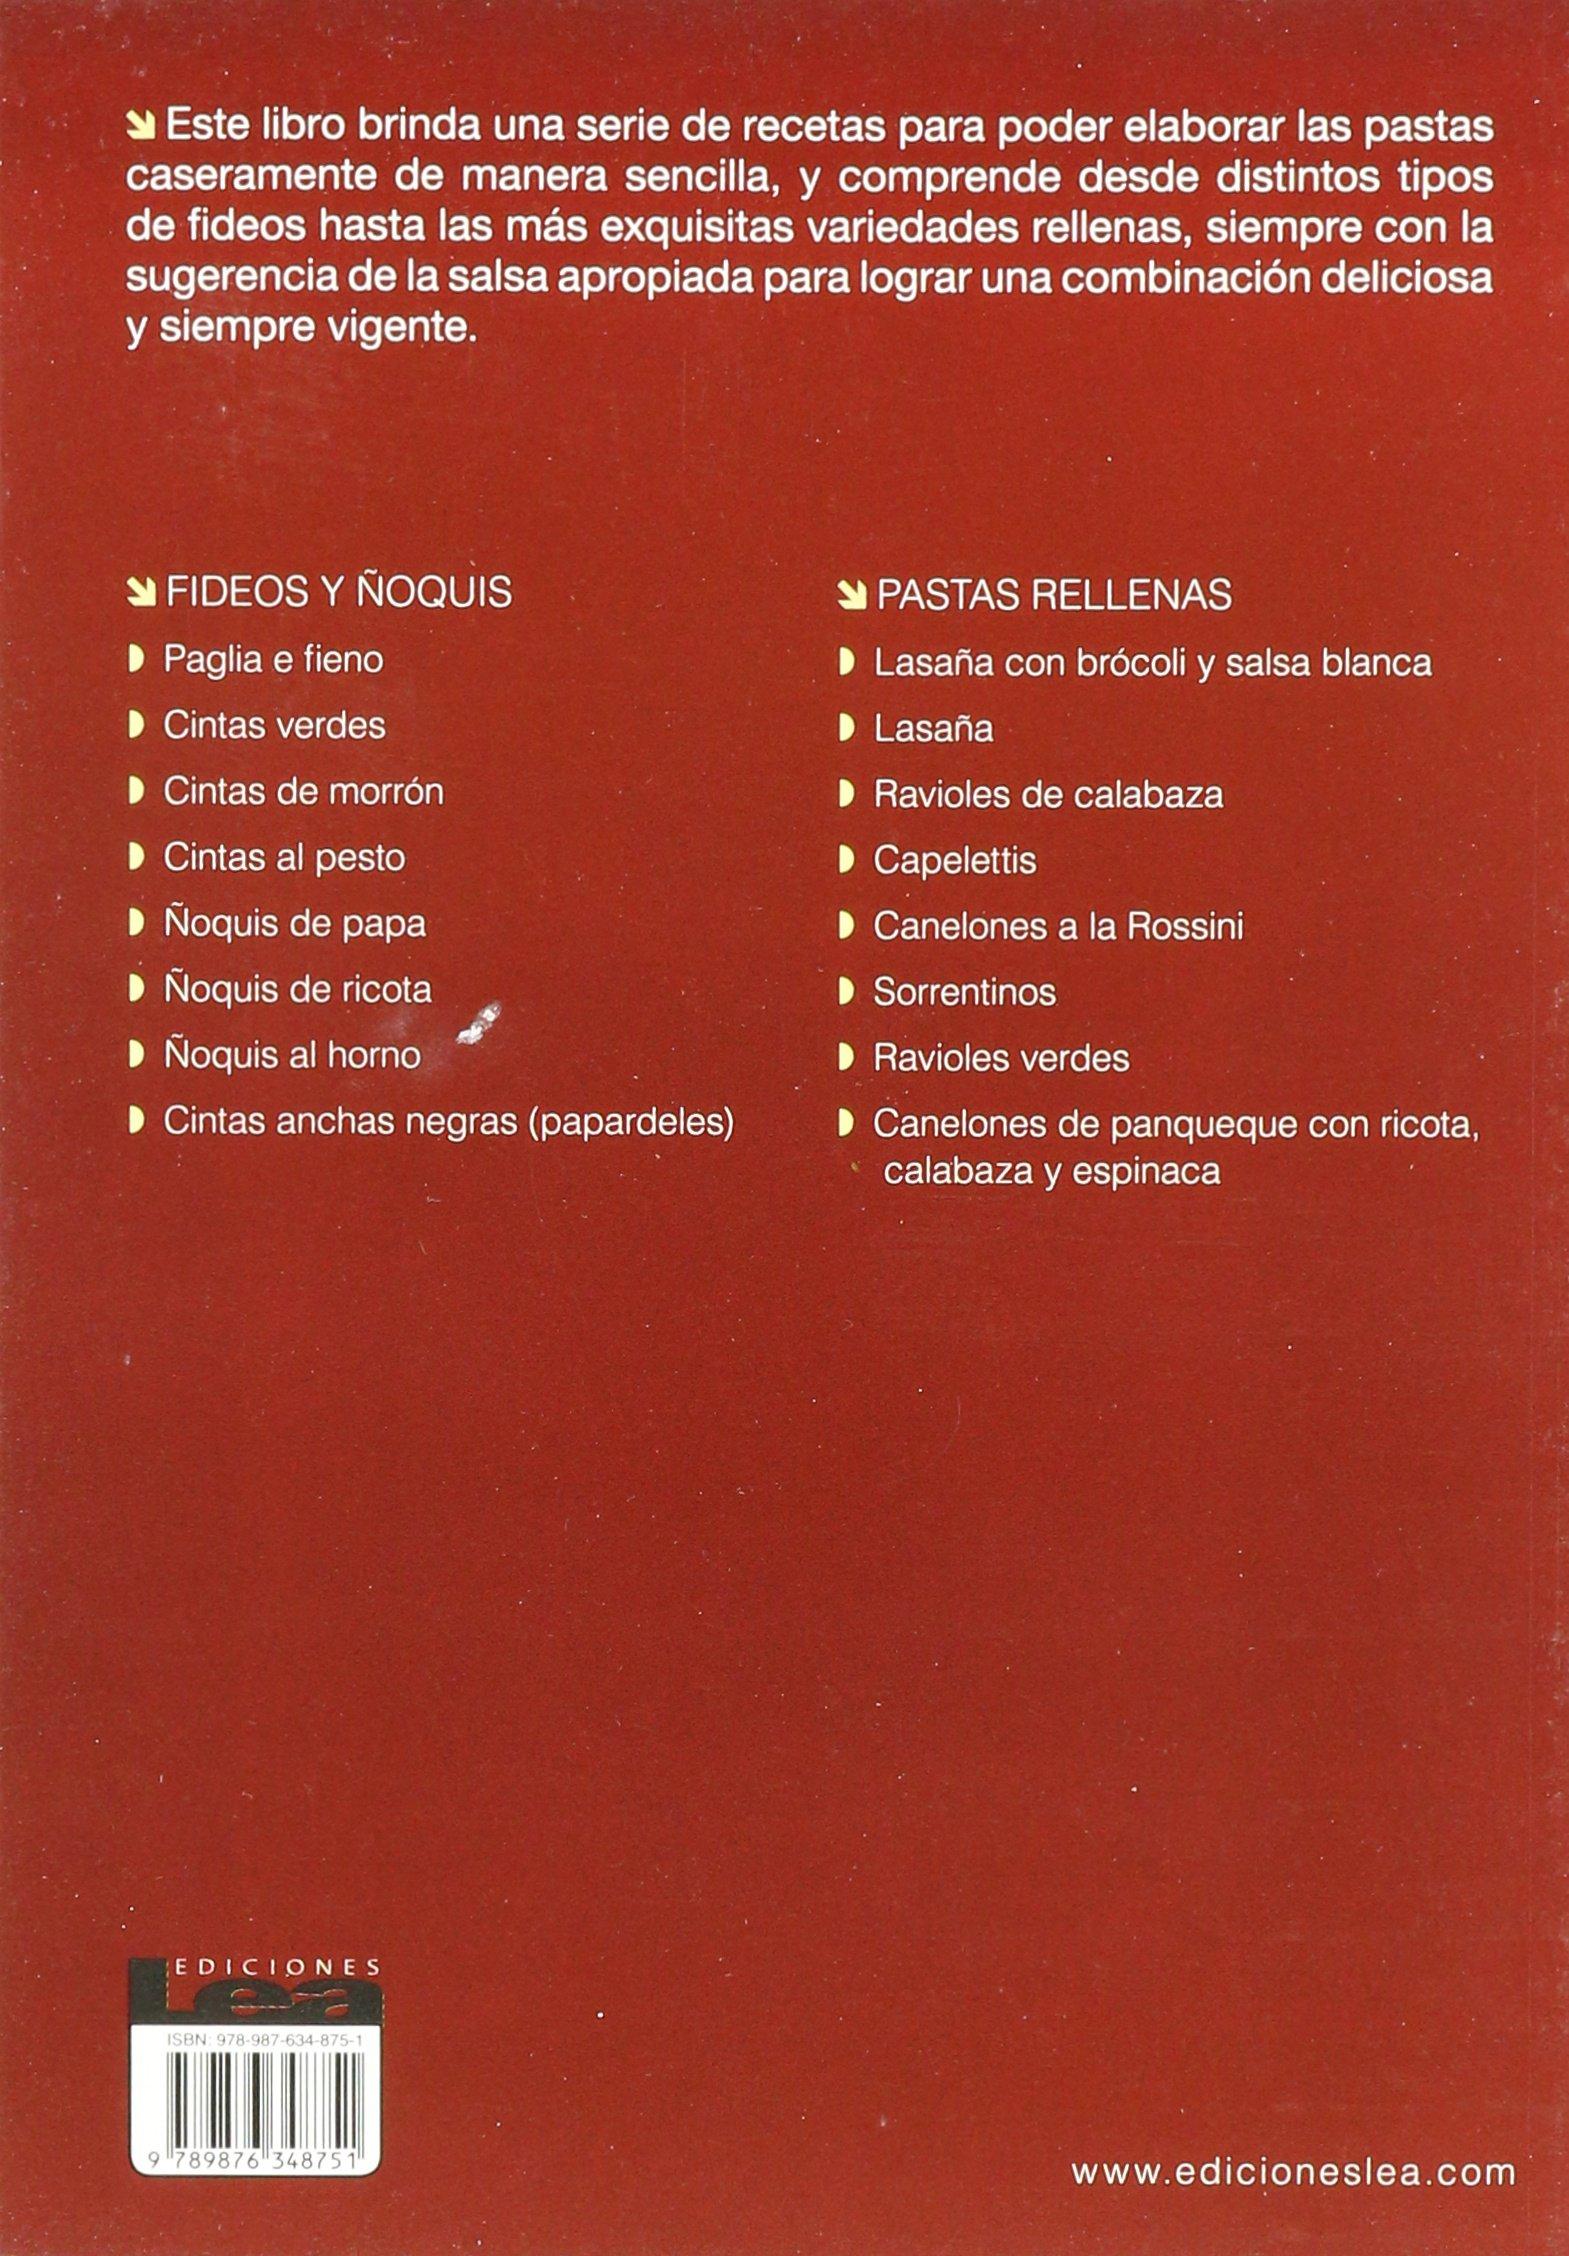 Amazon.com: Los secretos de la pasta hecha en casa (Spanish Edition) (9789876348751): Mónica Ponttiroli: Books